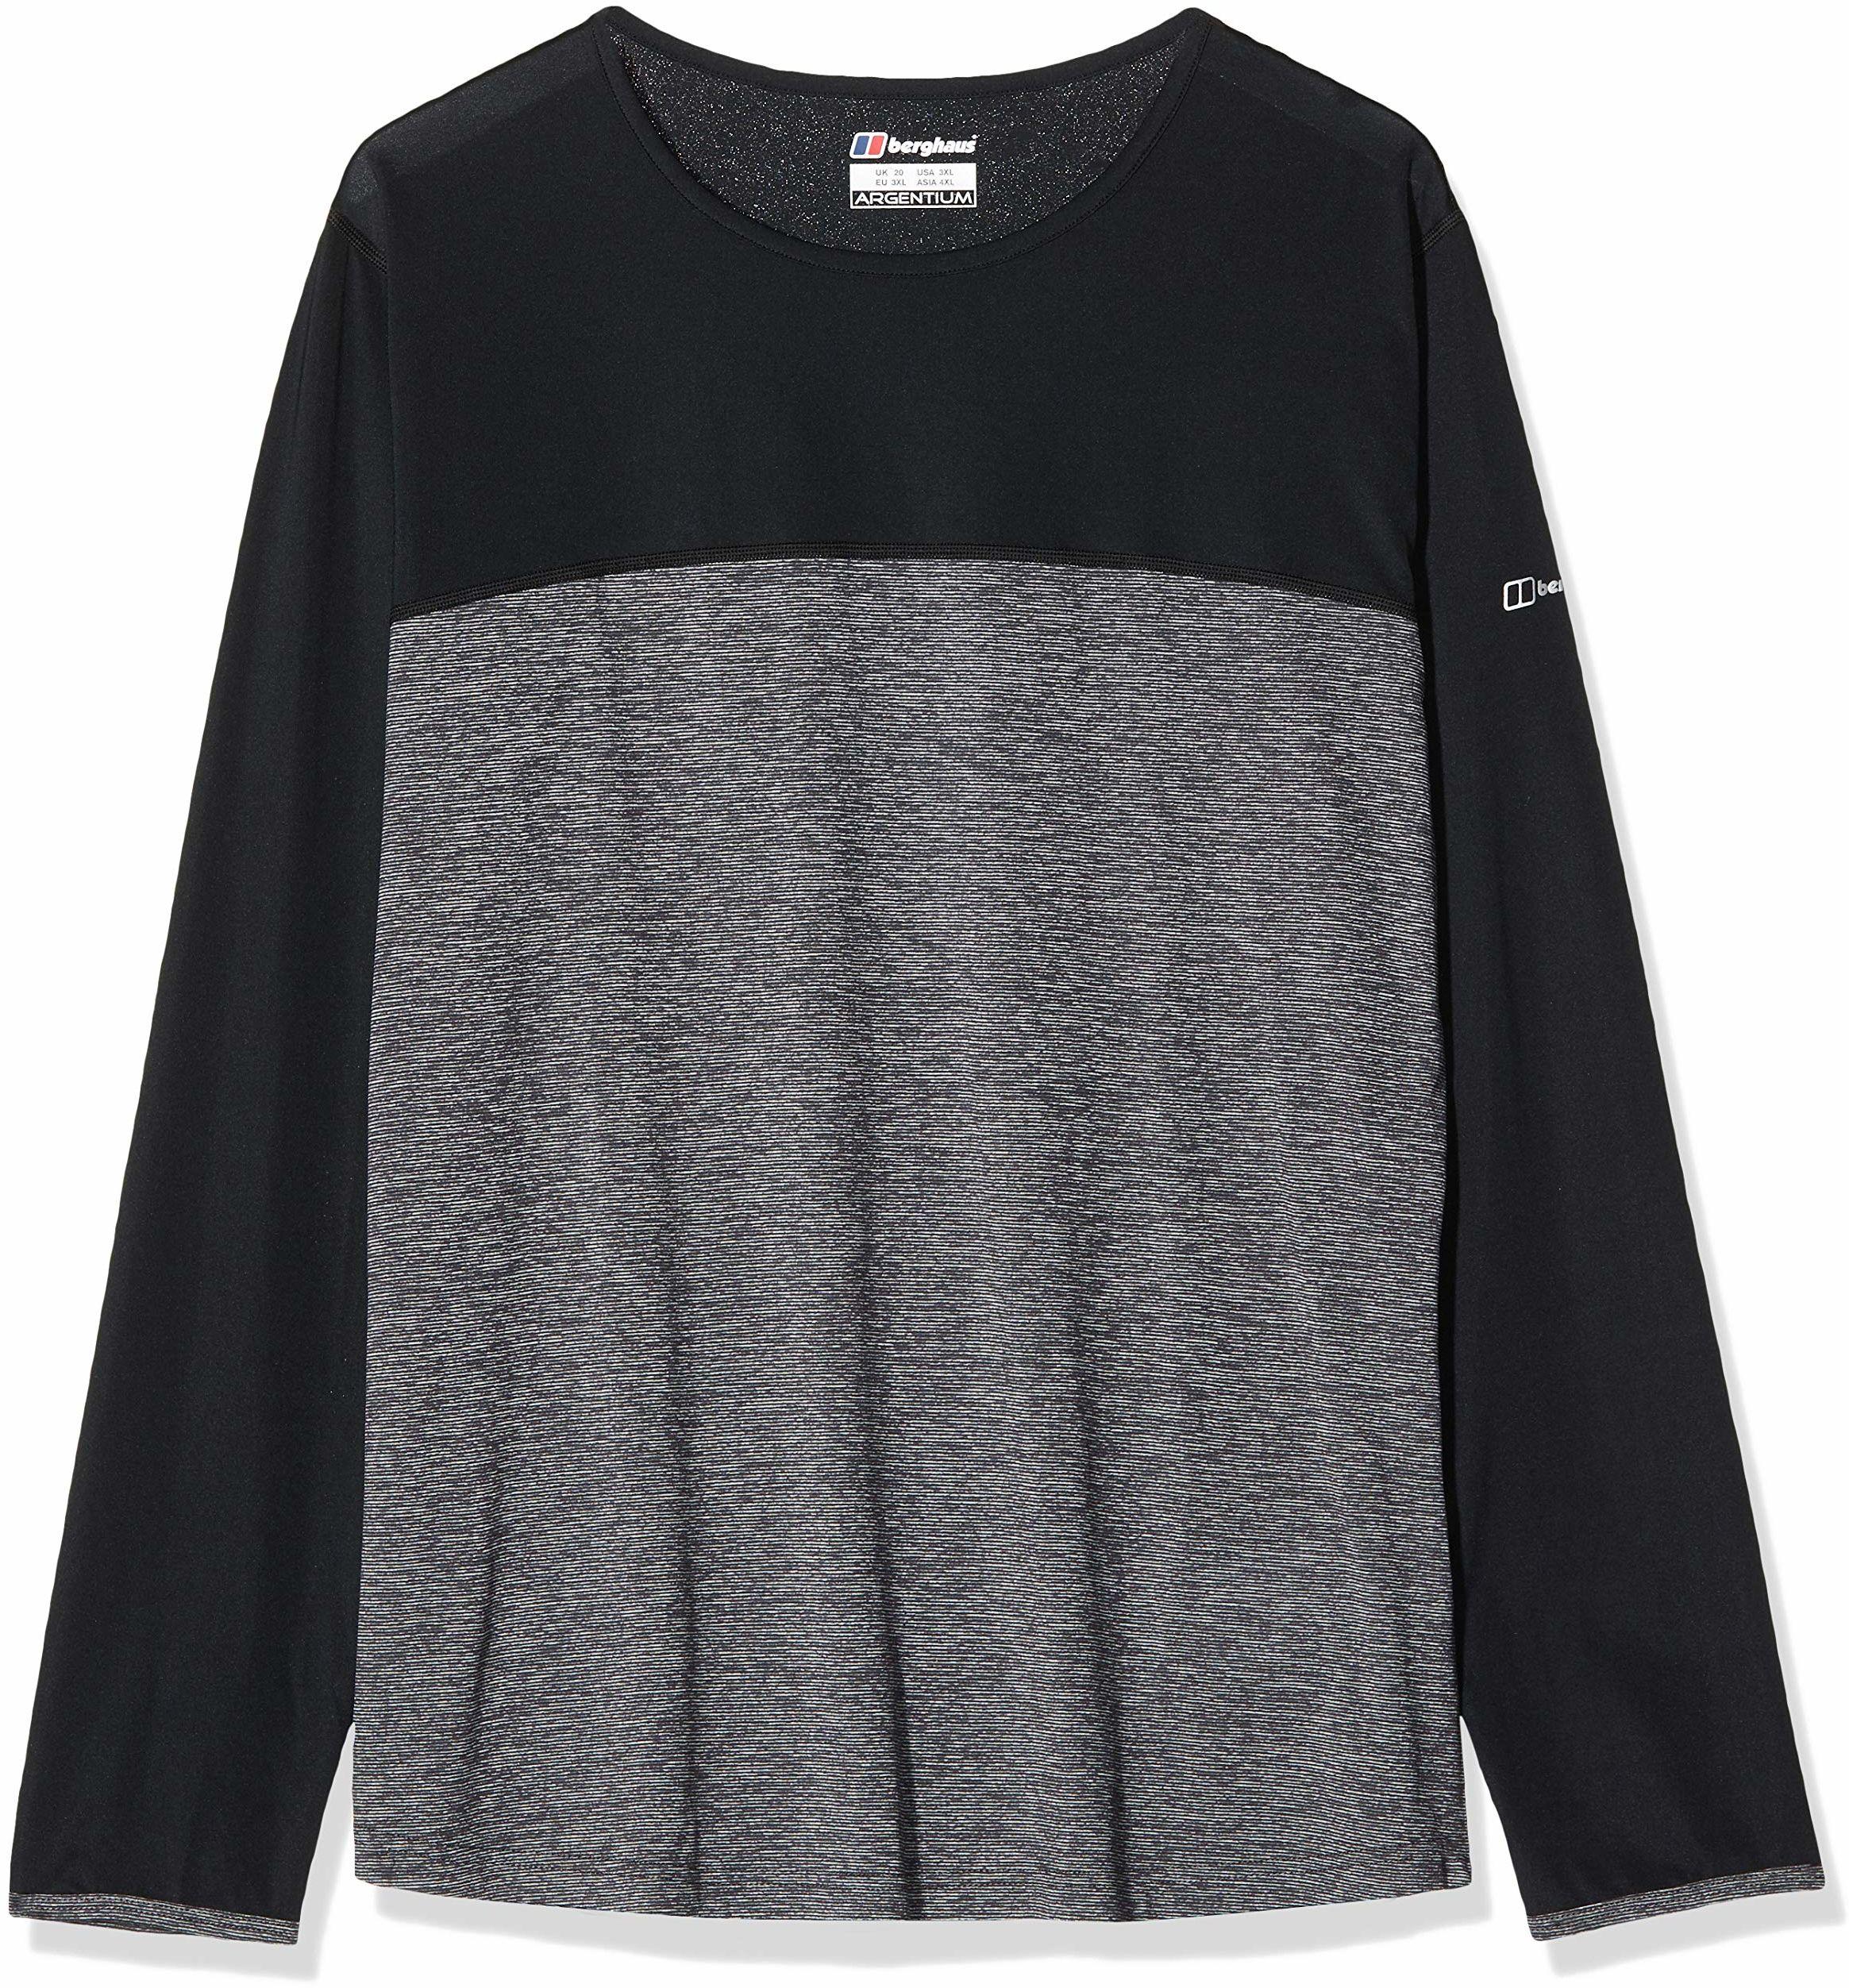 Berghaus Damska koszulka z długim rękawem Voyager Tech Tee Base Layer, Carbon Marl/Jet Black, 12